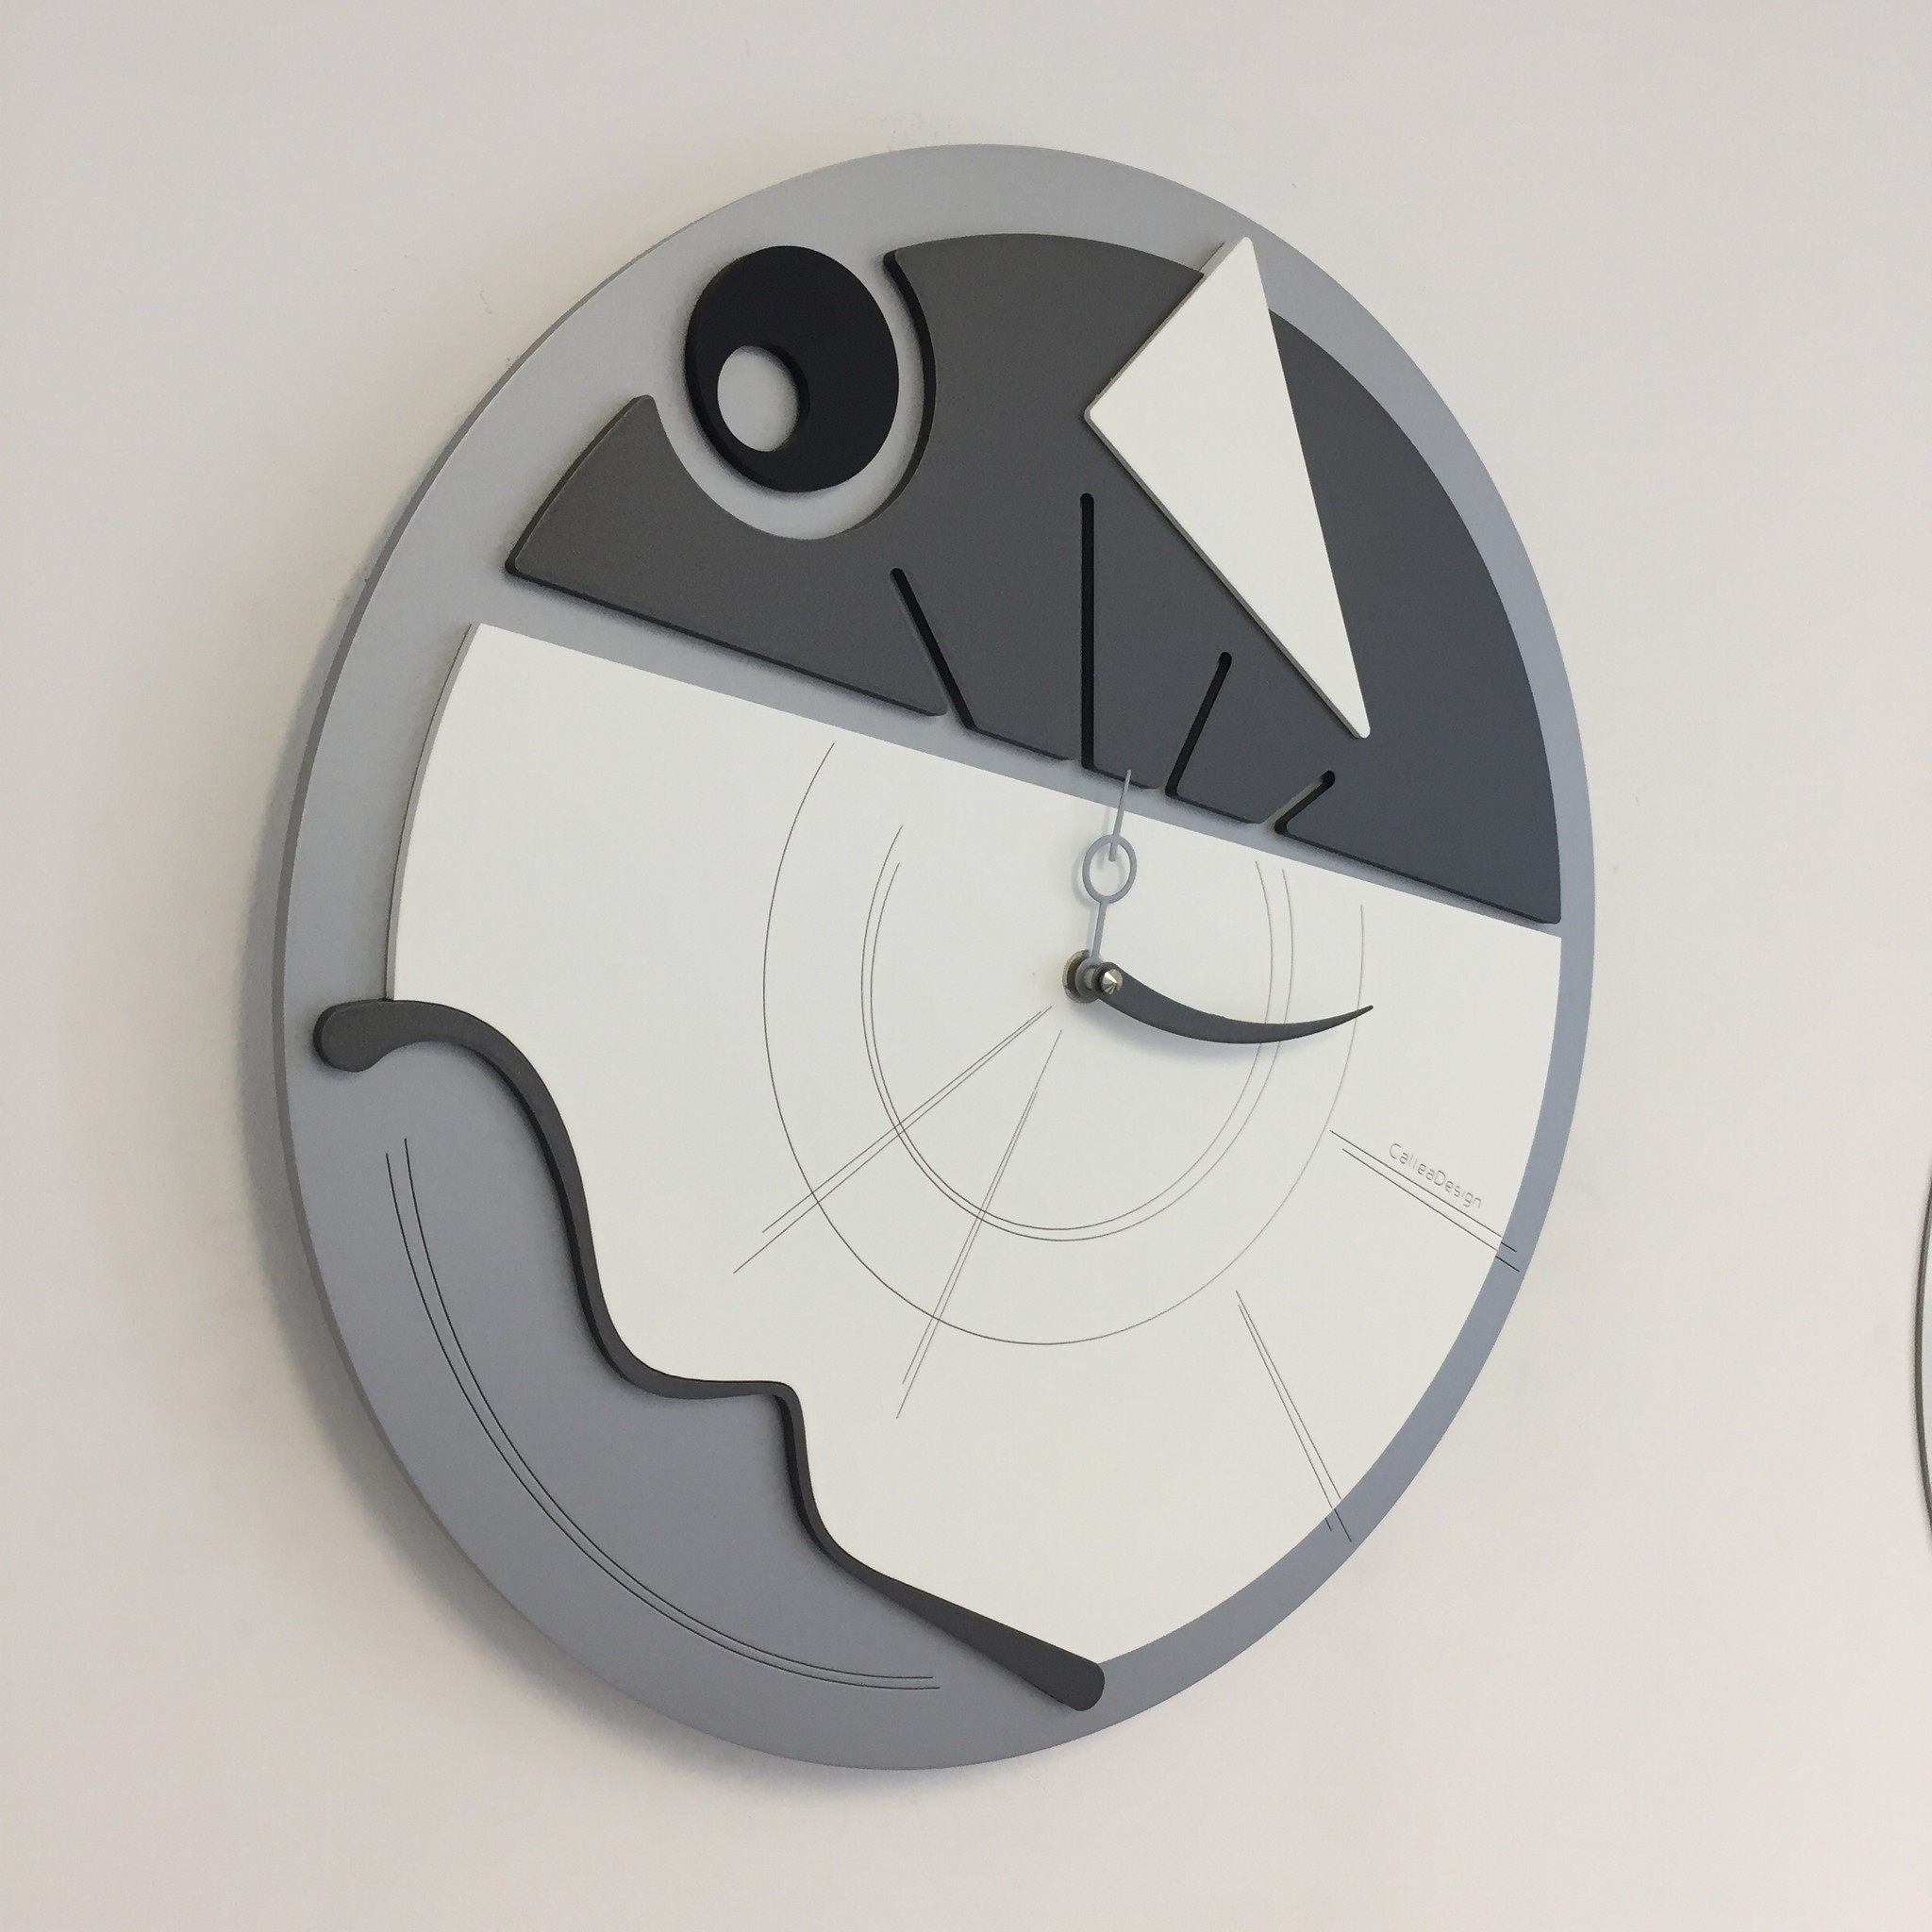 Callea Wandklok ART grijs